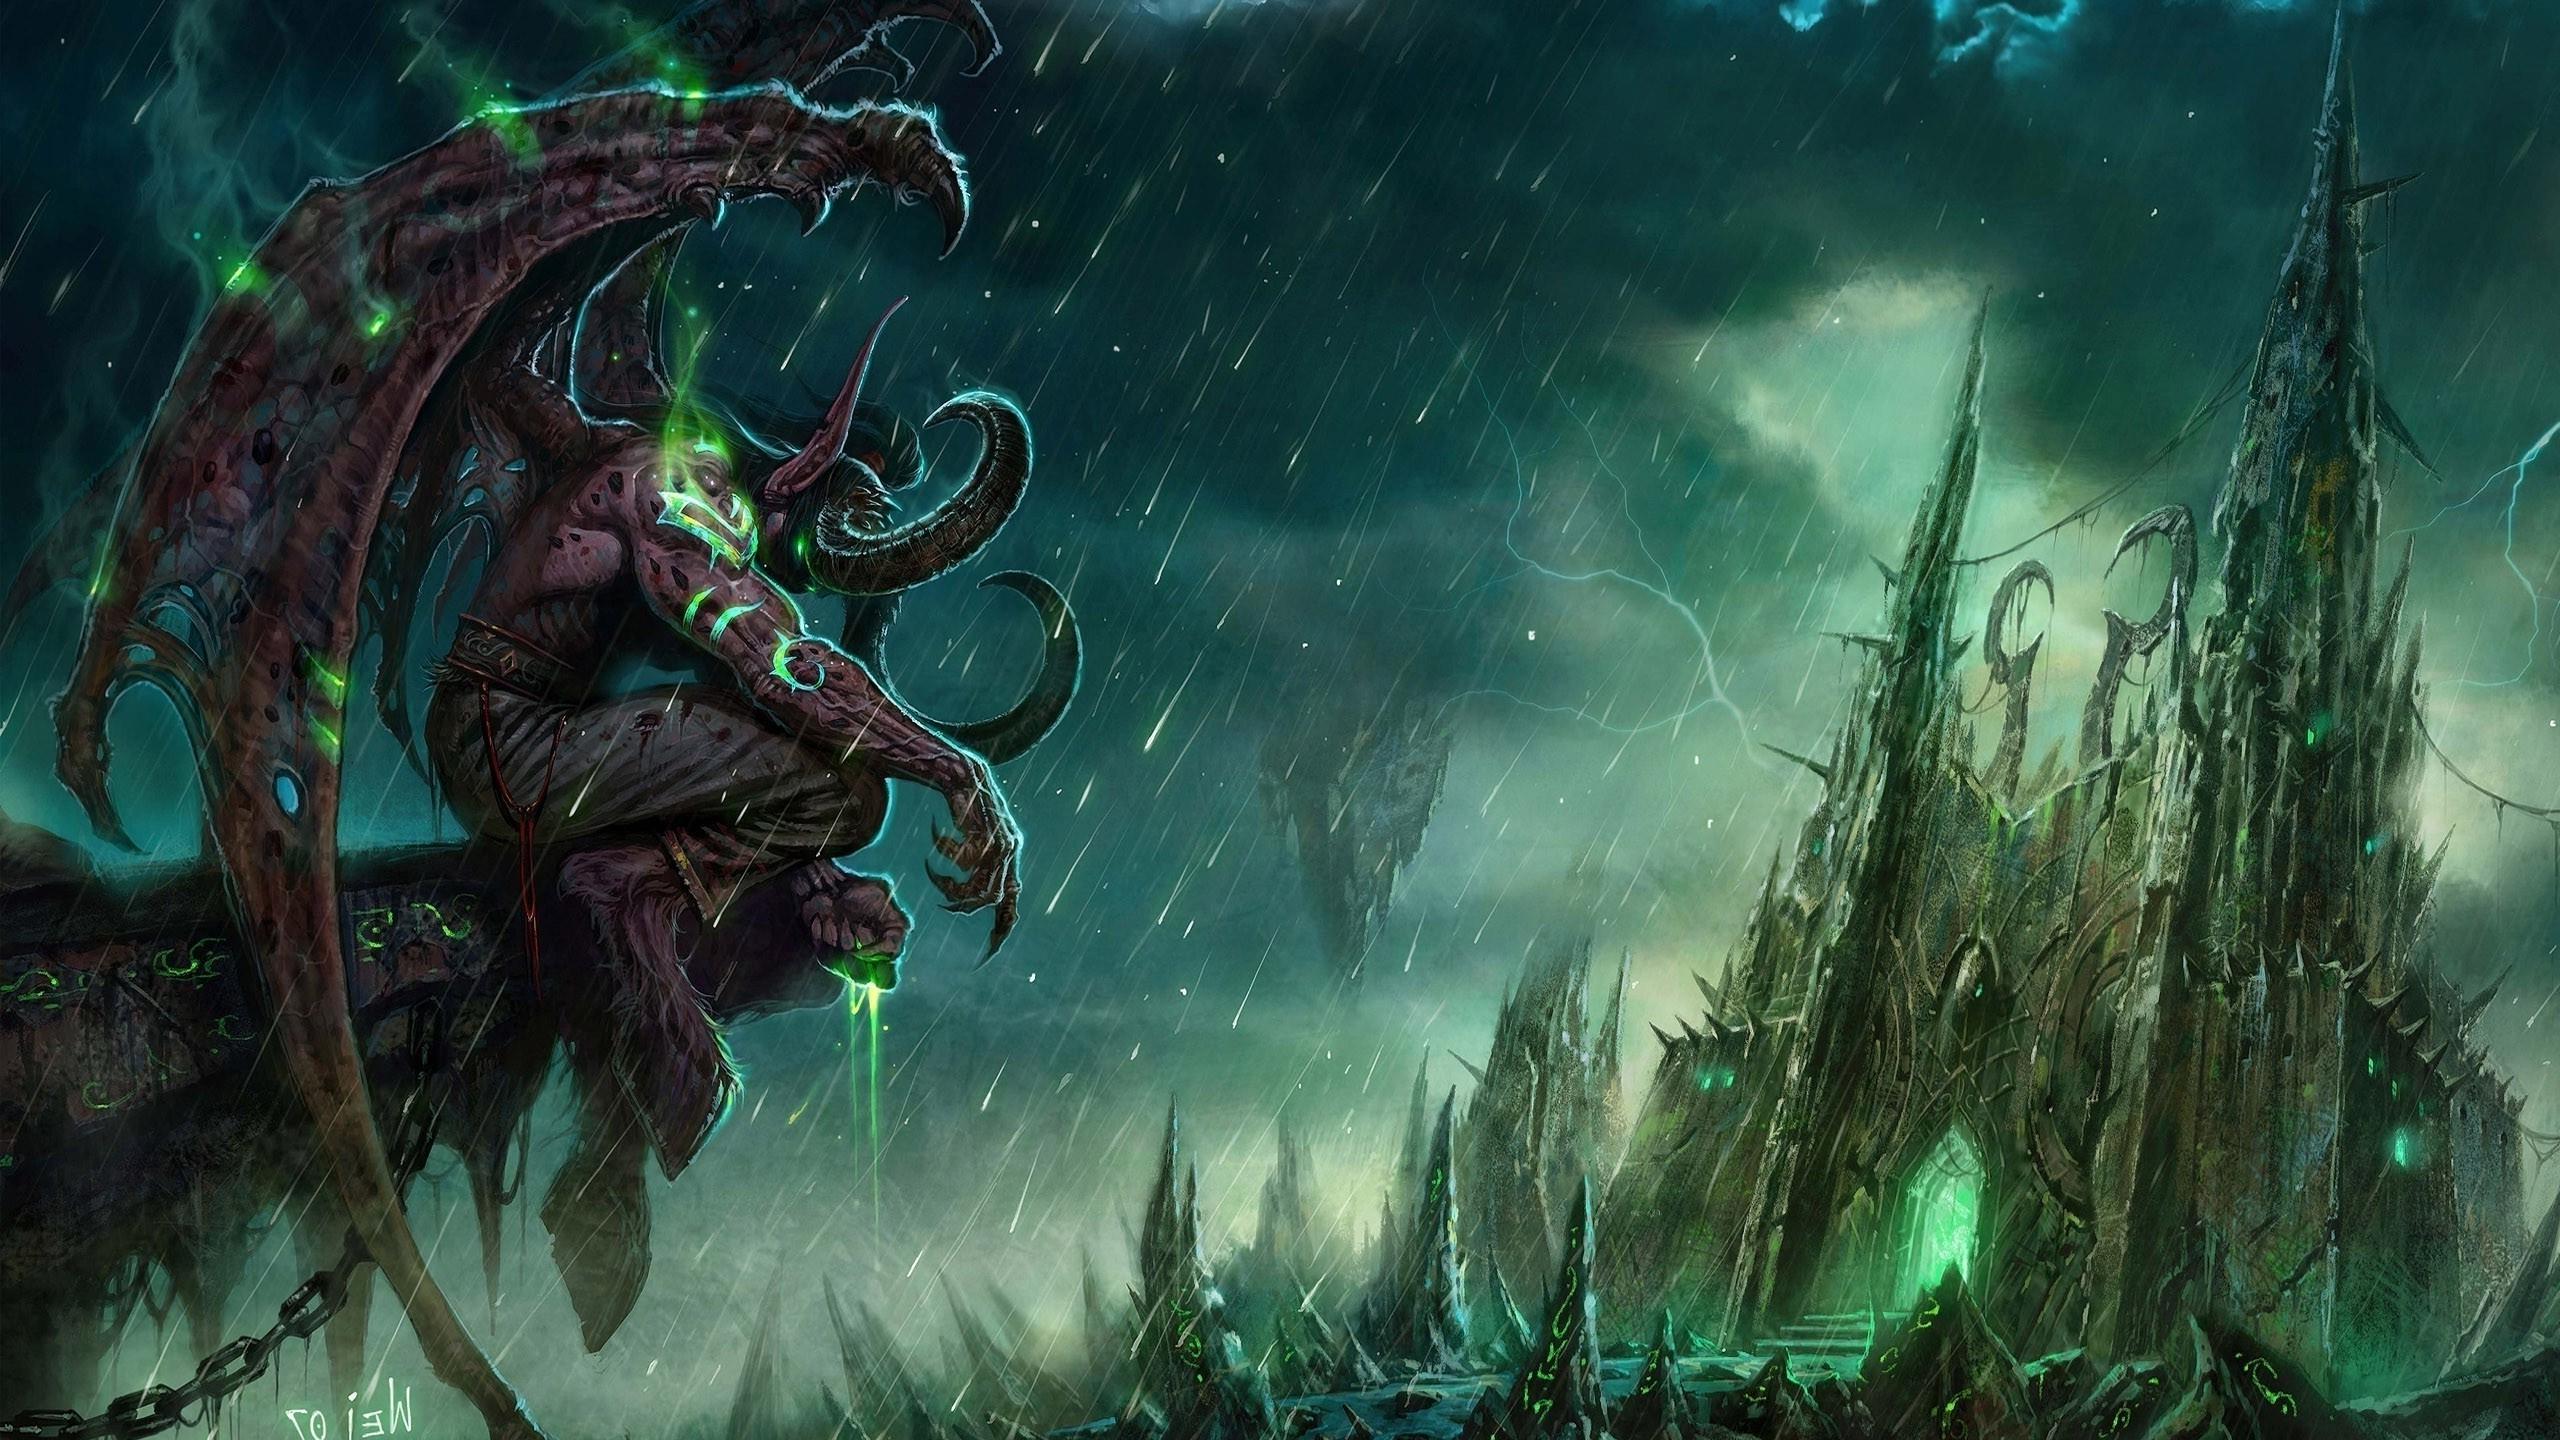 Wallpaper 2560x1440 Px World Of Warcraft The Burning Crusade